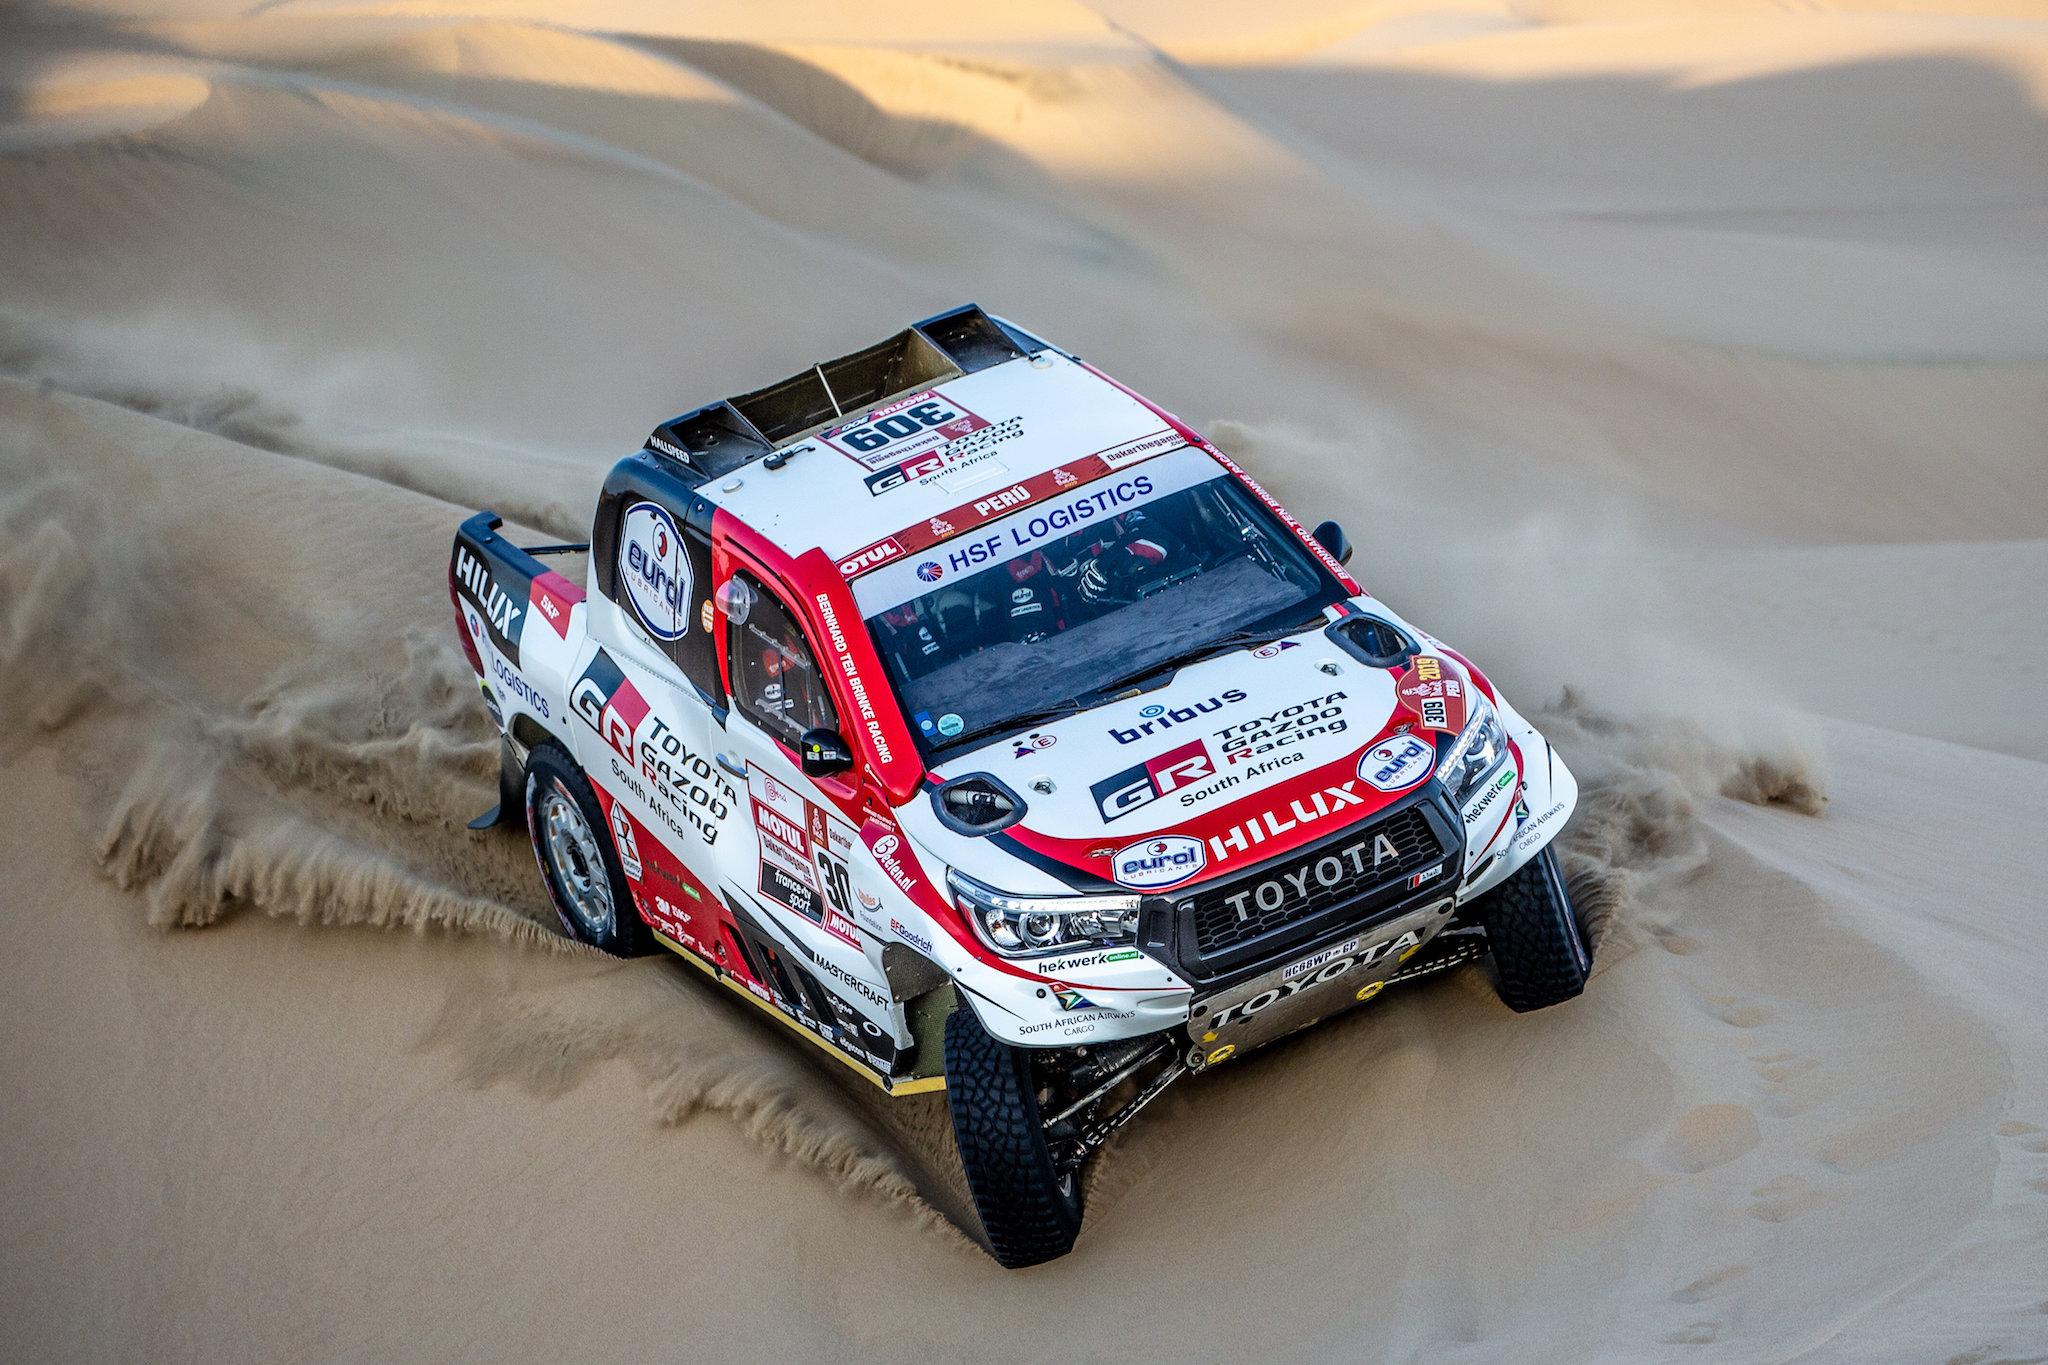 Voor Bernhard ten Brinke begint Dakar 2020 in Qatar